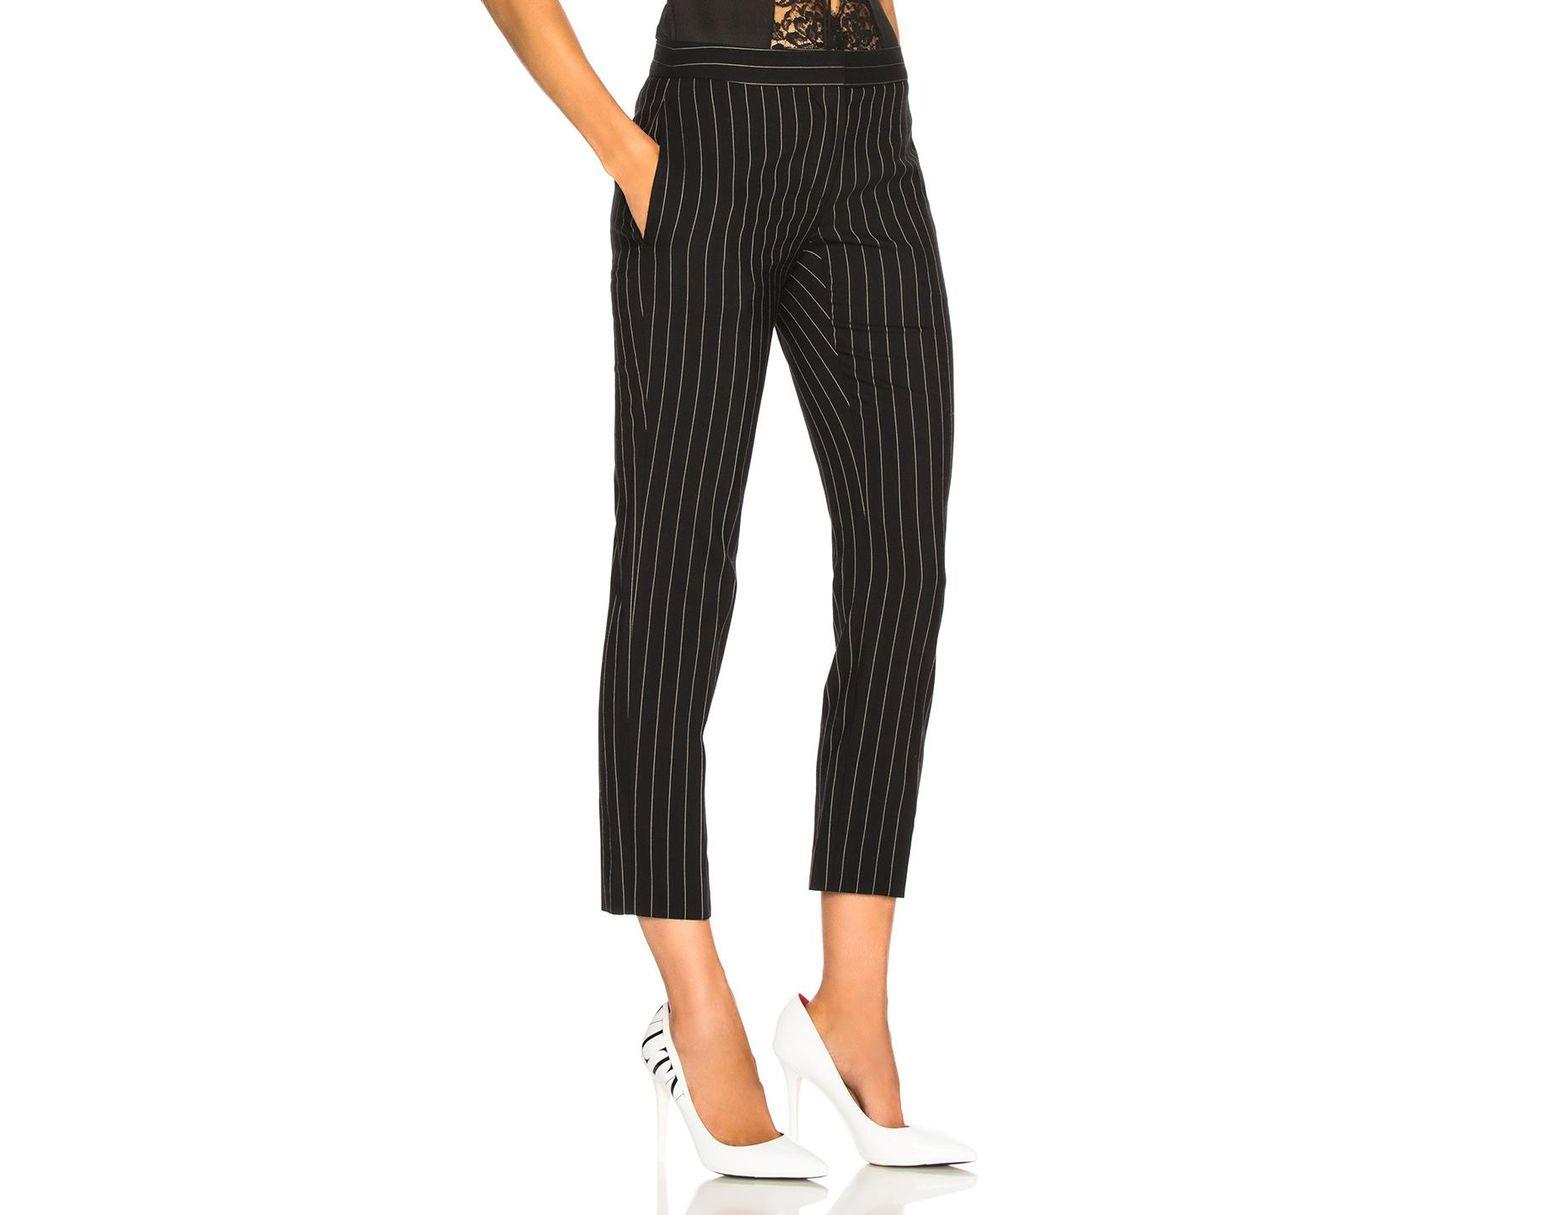 623ccd1817 Women's Black Pinstripe Cigarette Pants